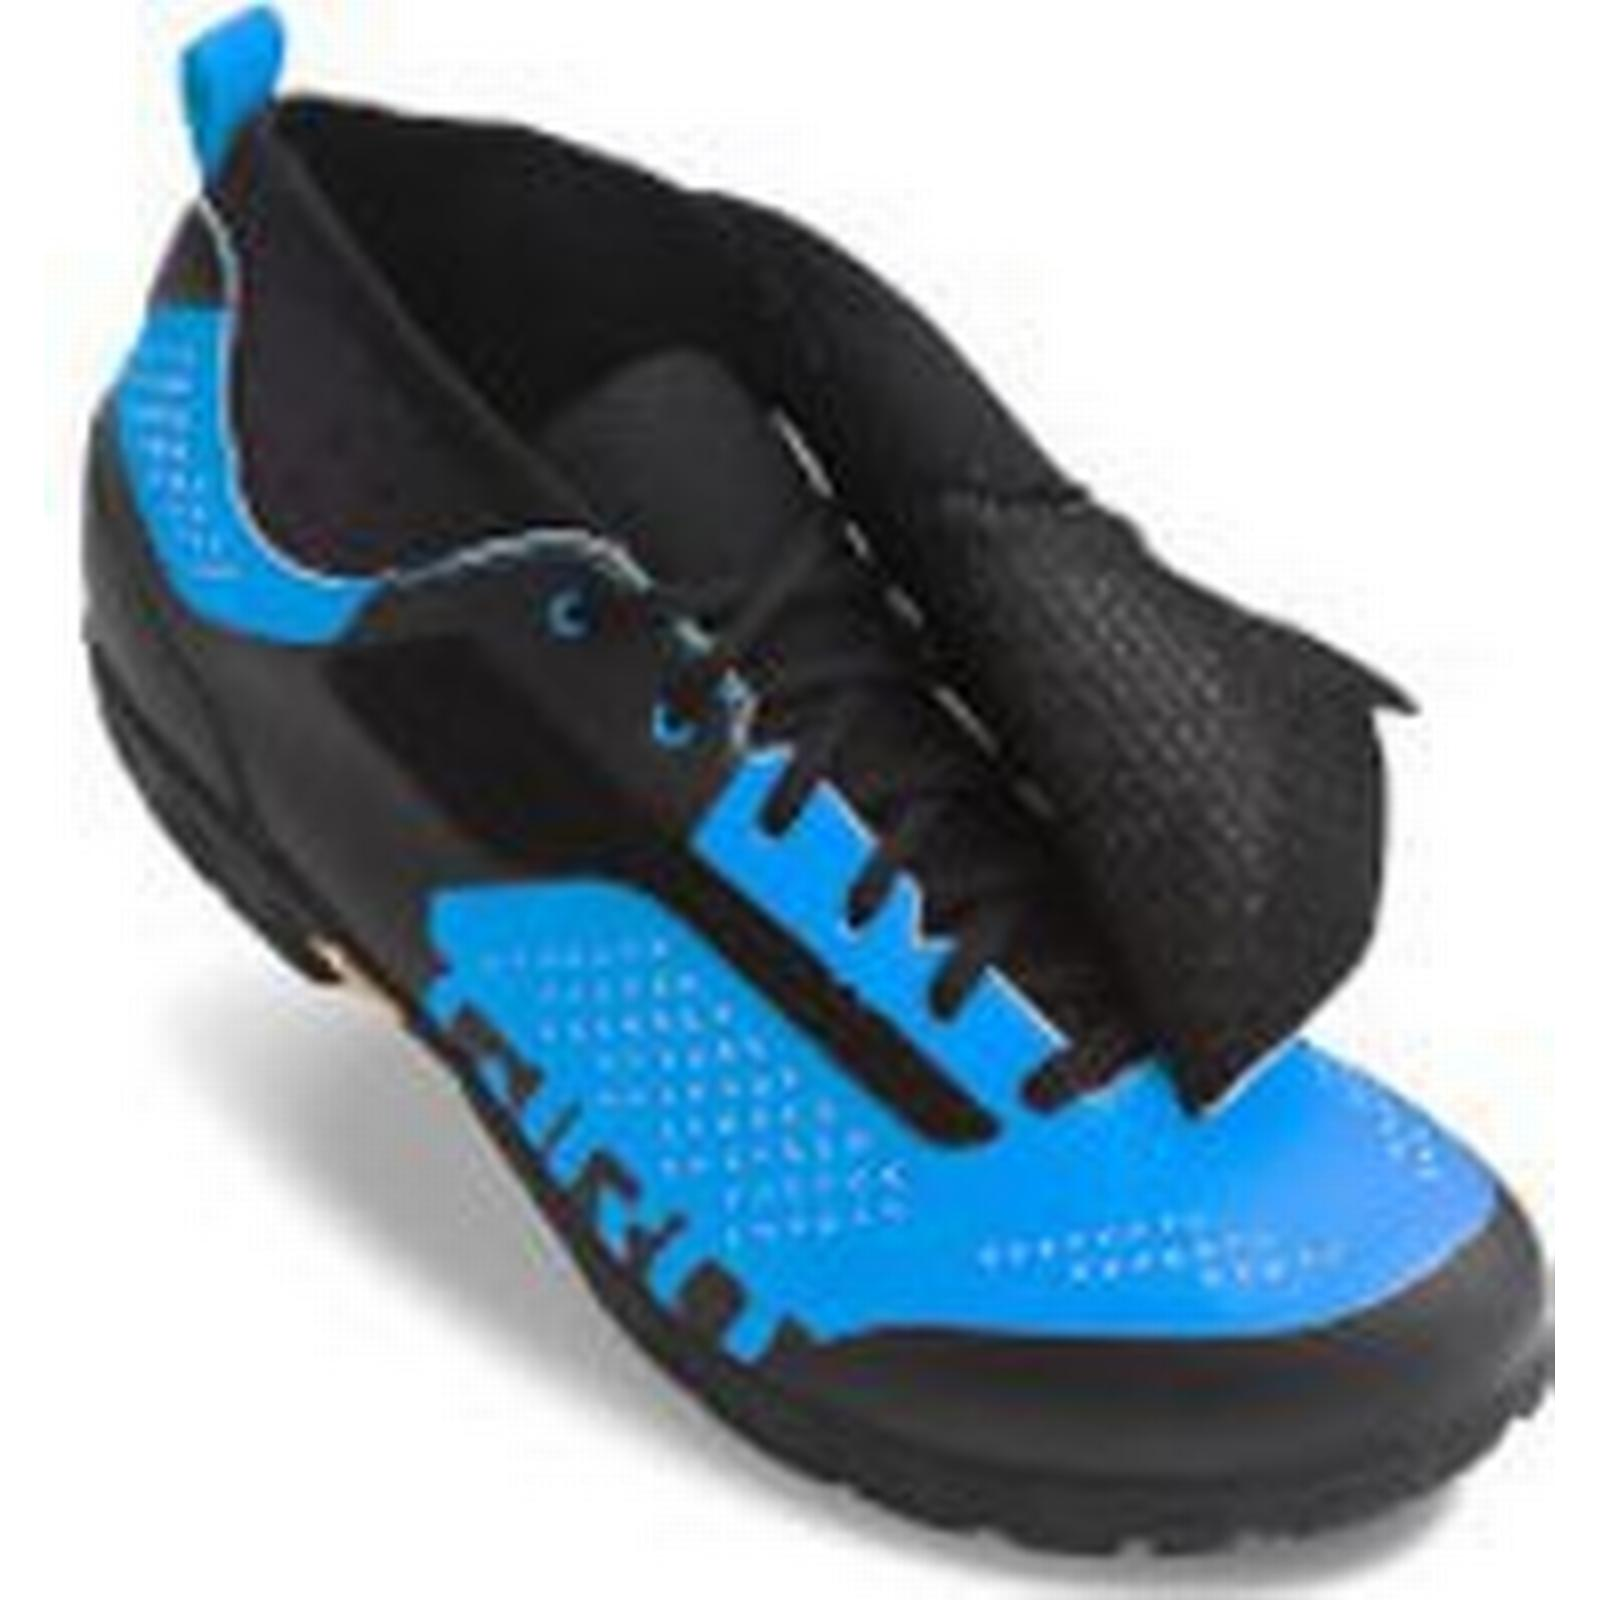 Giro Terraduro Mid MTB Cycling - Shoes - Blue Jewel - Cycling EU 42/UK 8 - Blue 3a4650